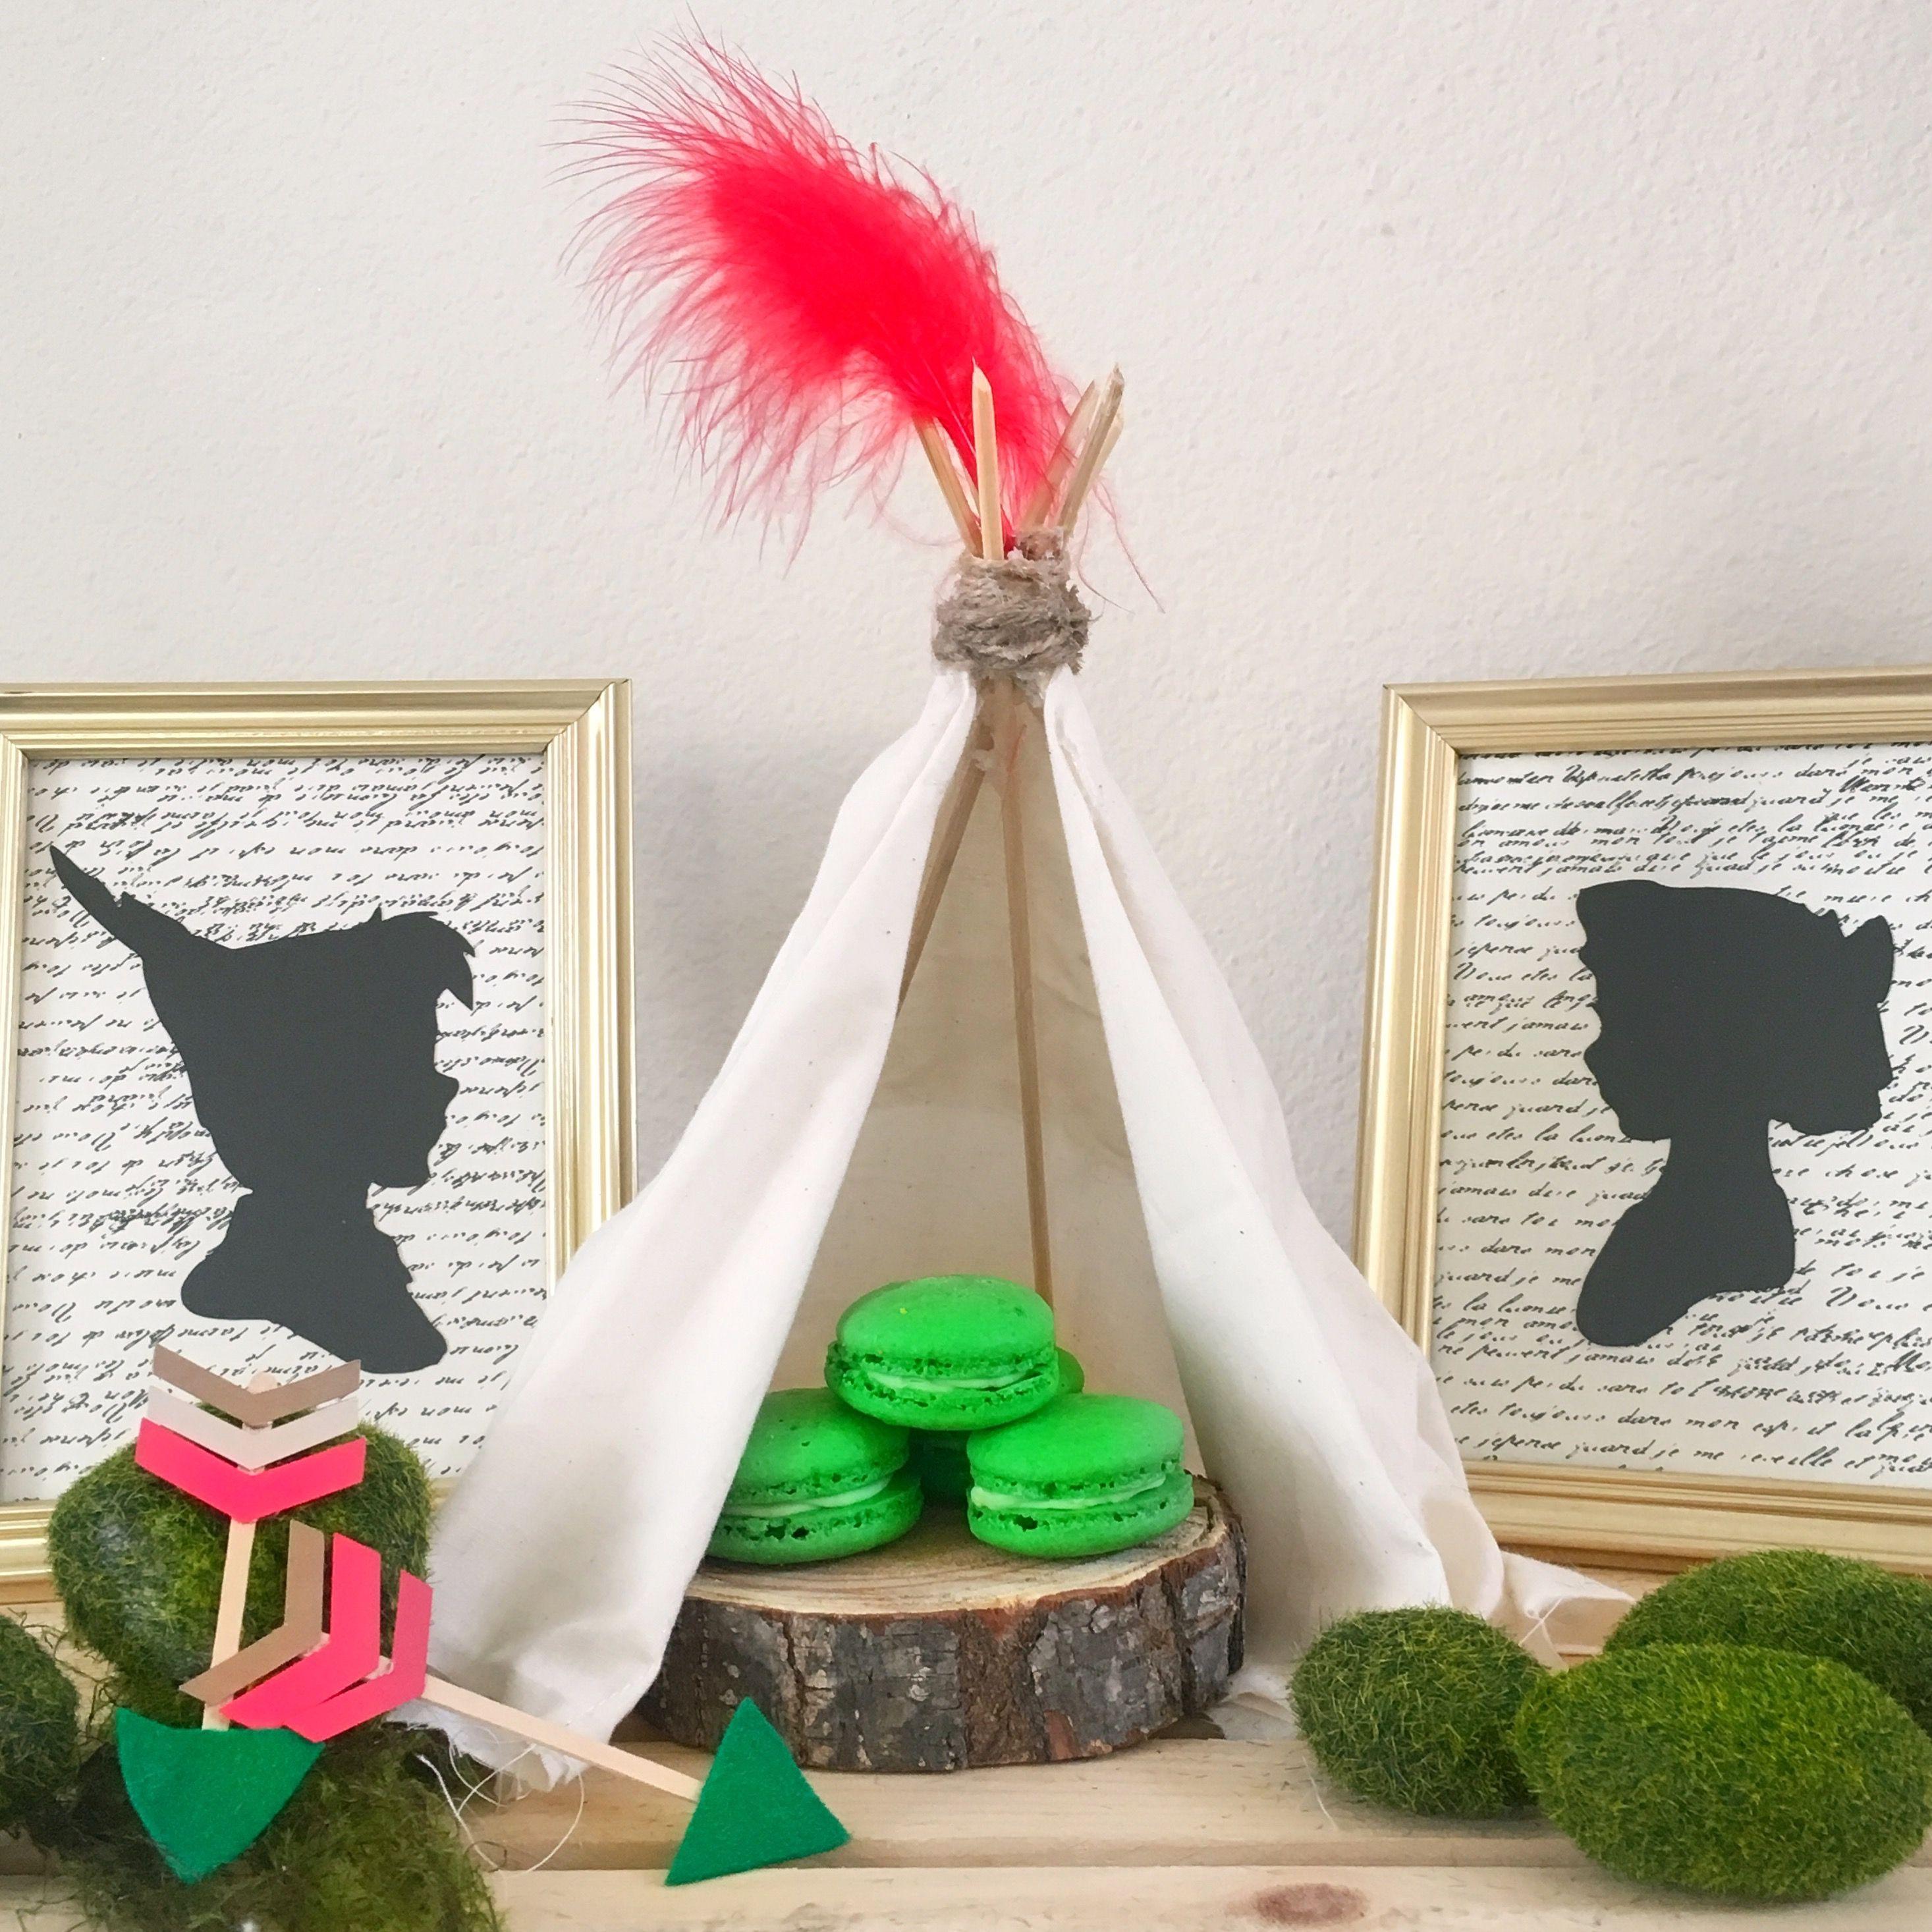 Lullaby Land Nursery Decorating Ideas: SugarPartiesLA Peter Pan Party,neverland,teepee ,macroons